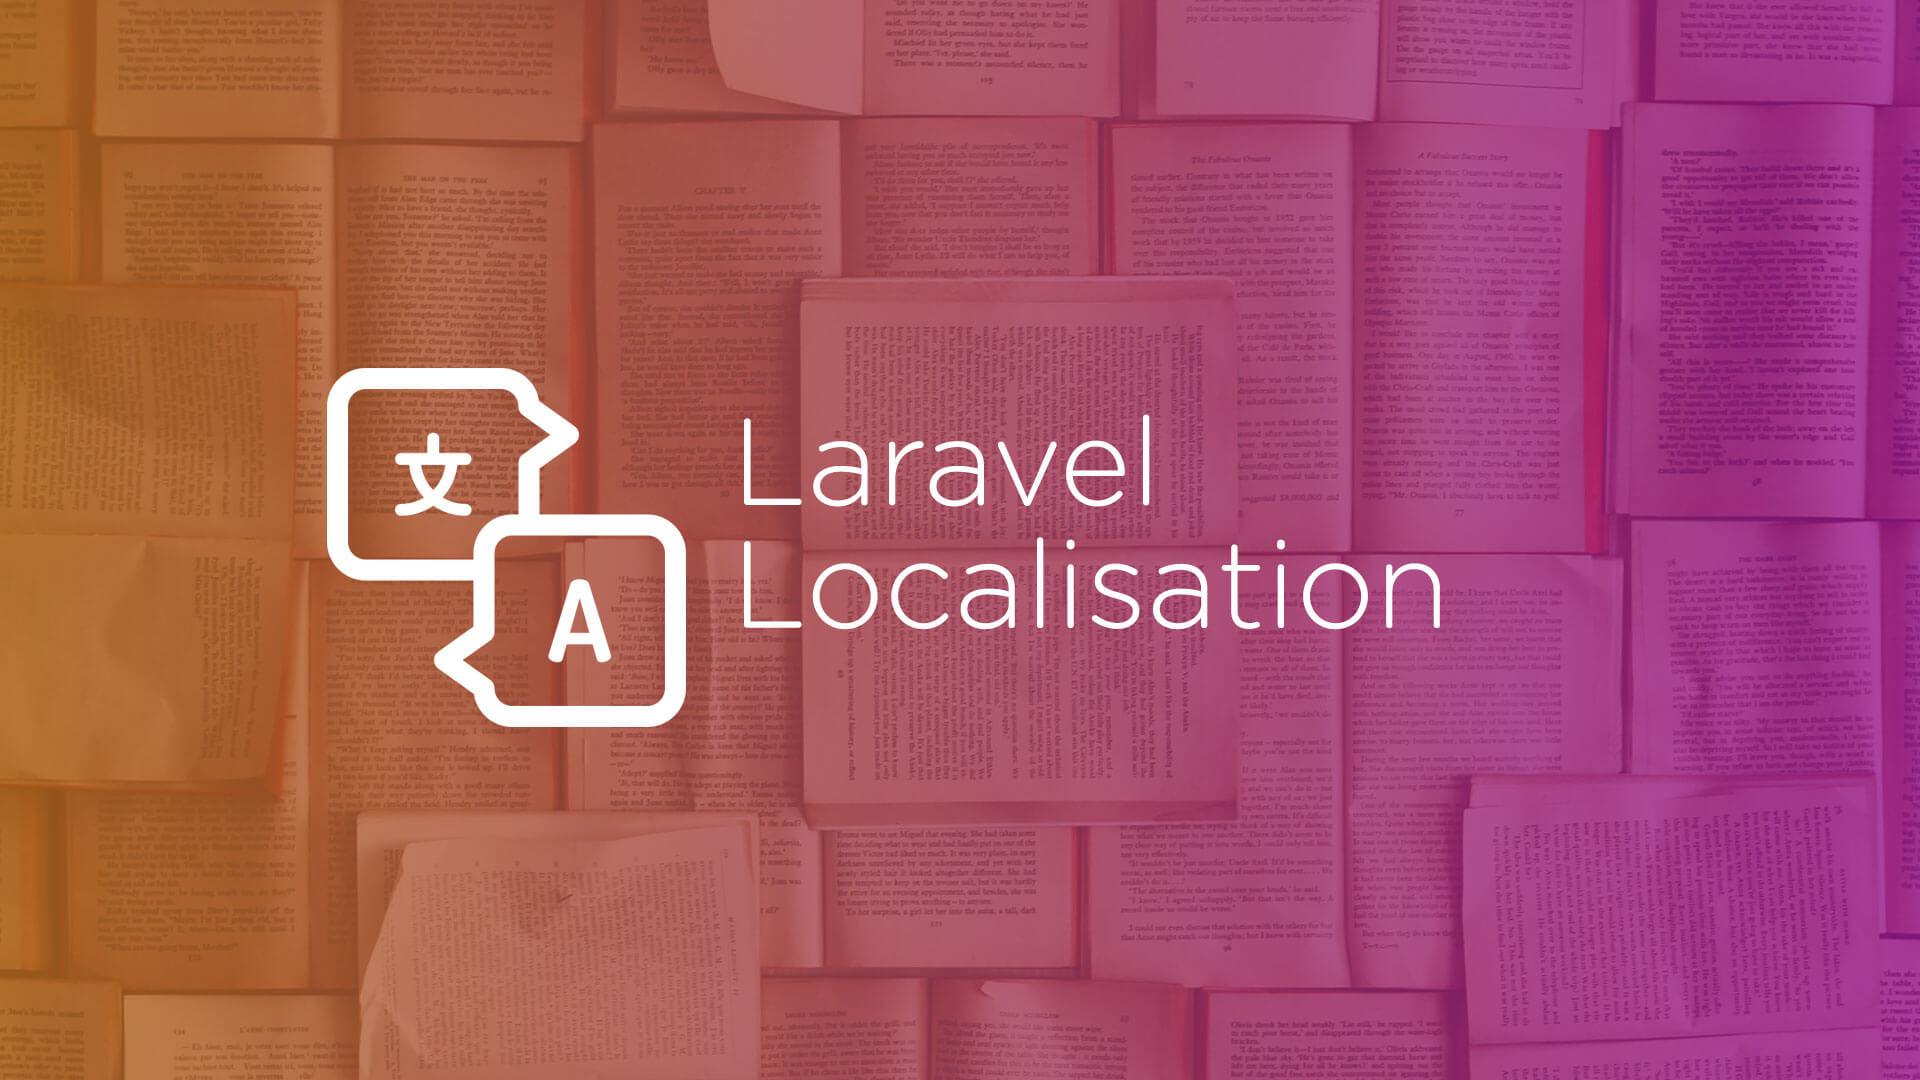 laravel -- Localisation